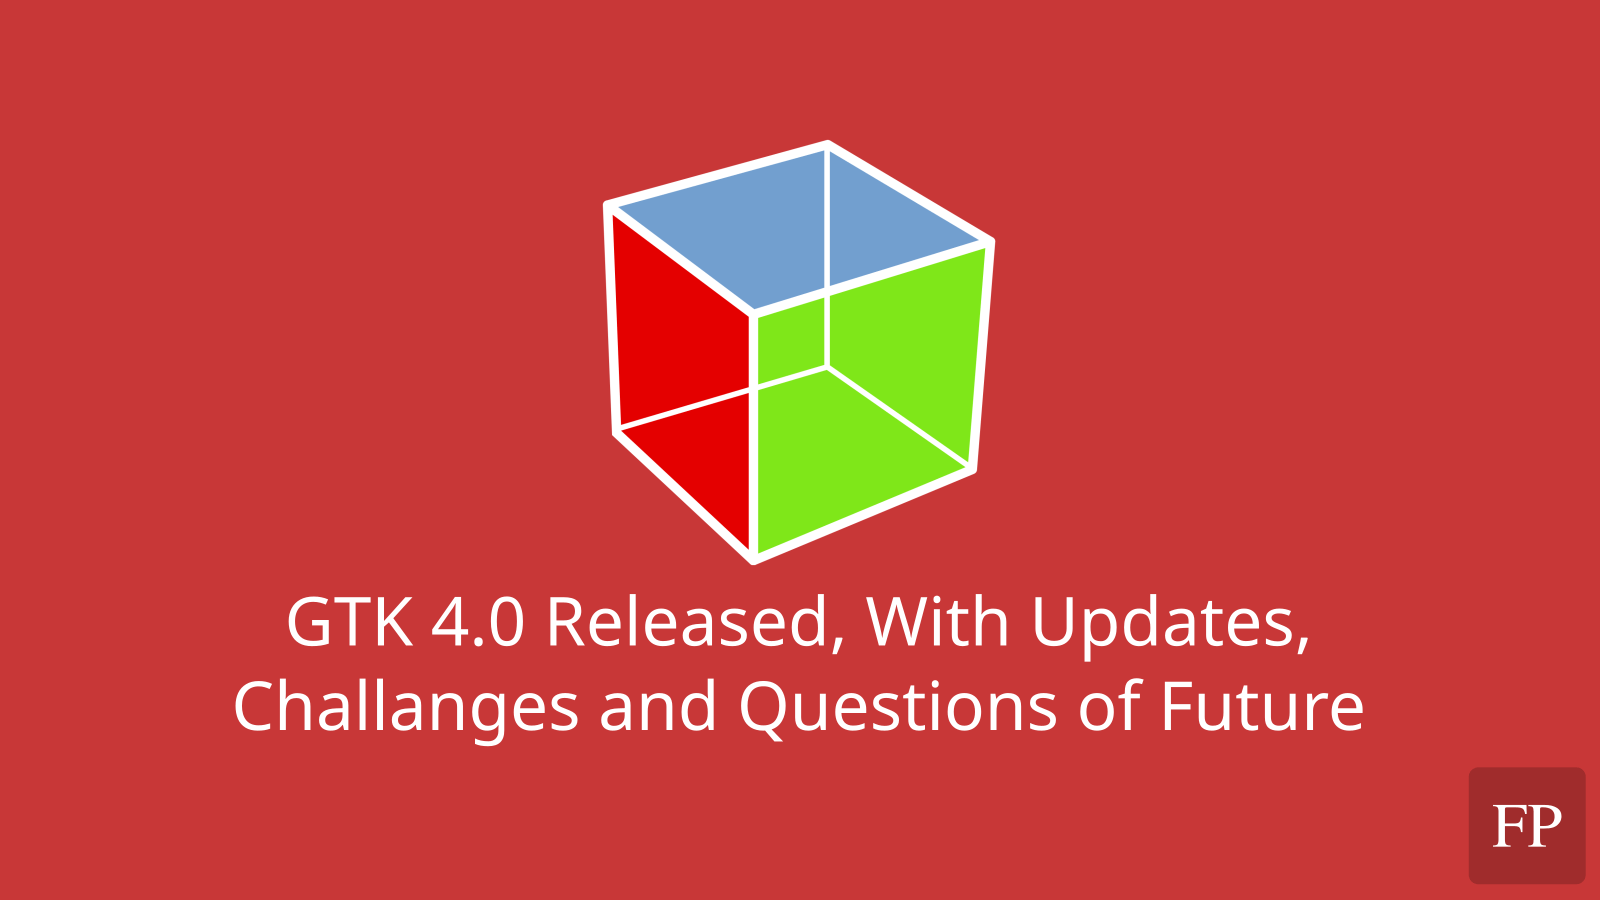 GTK 4.0 117 December 16, 2020